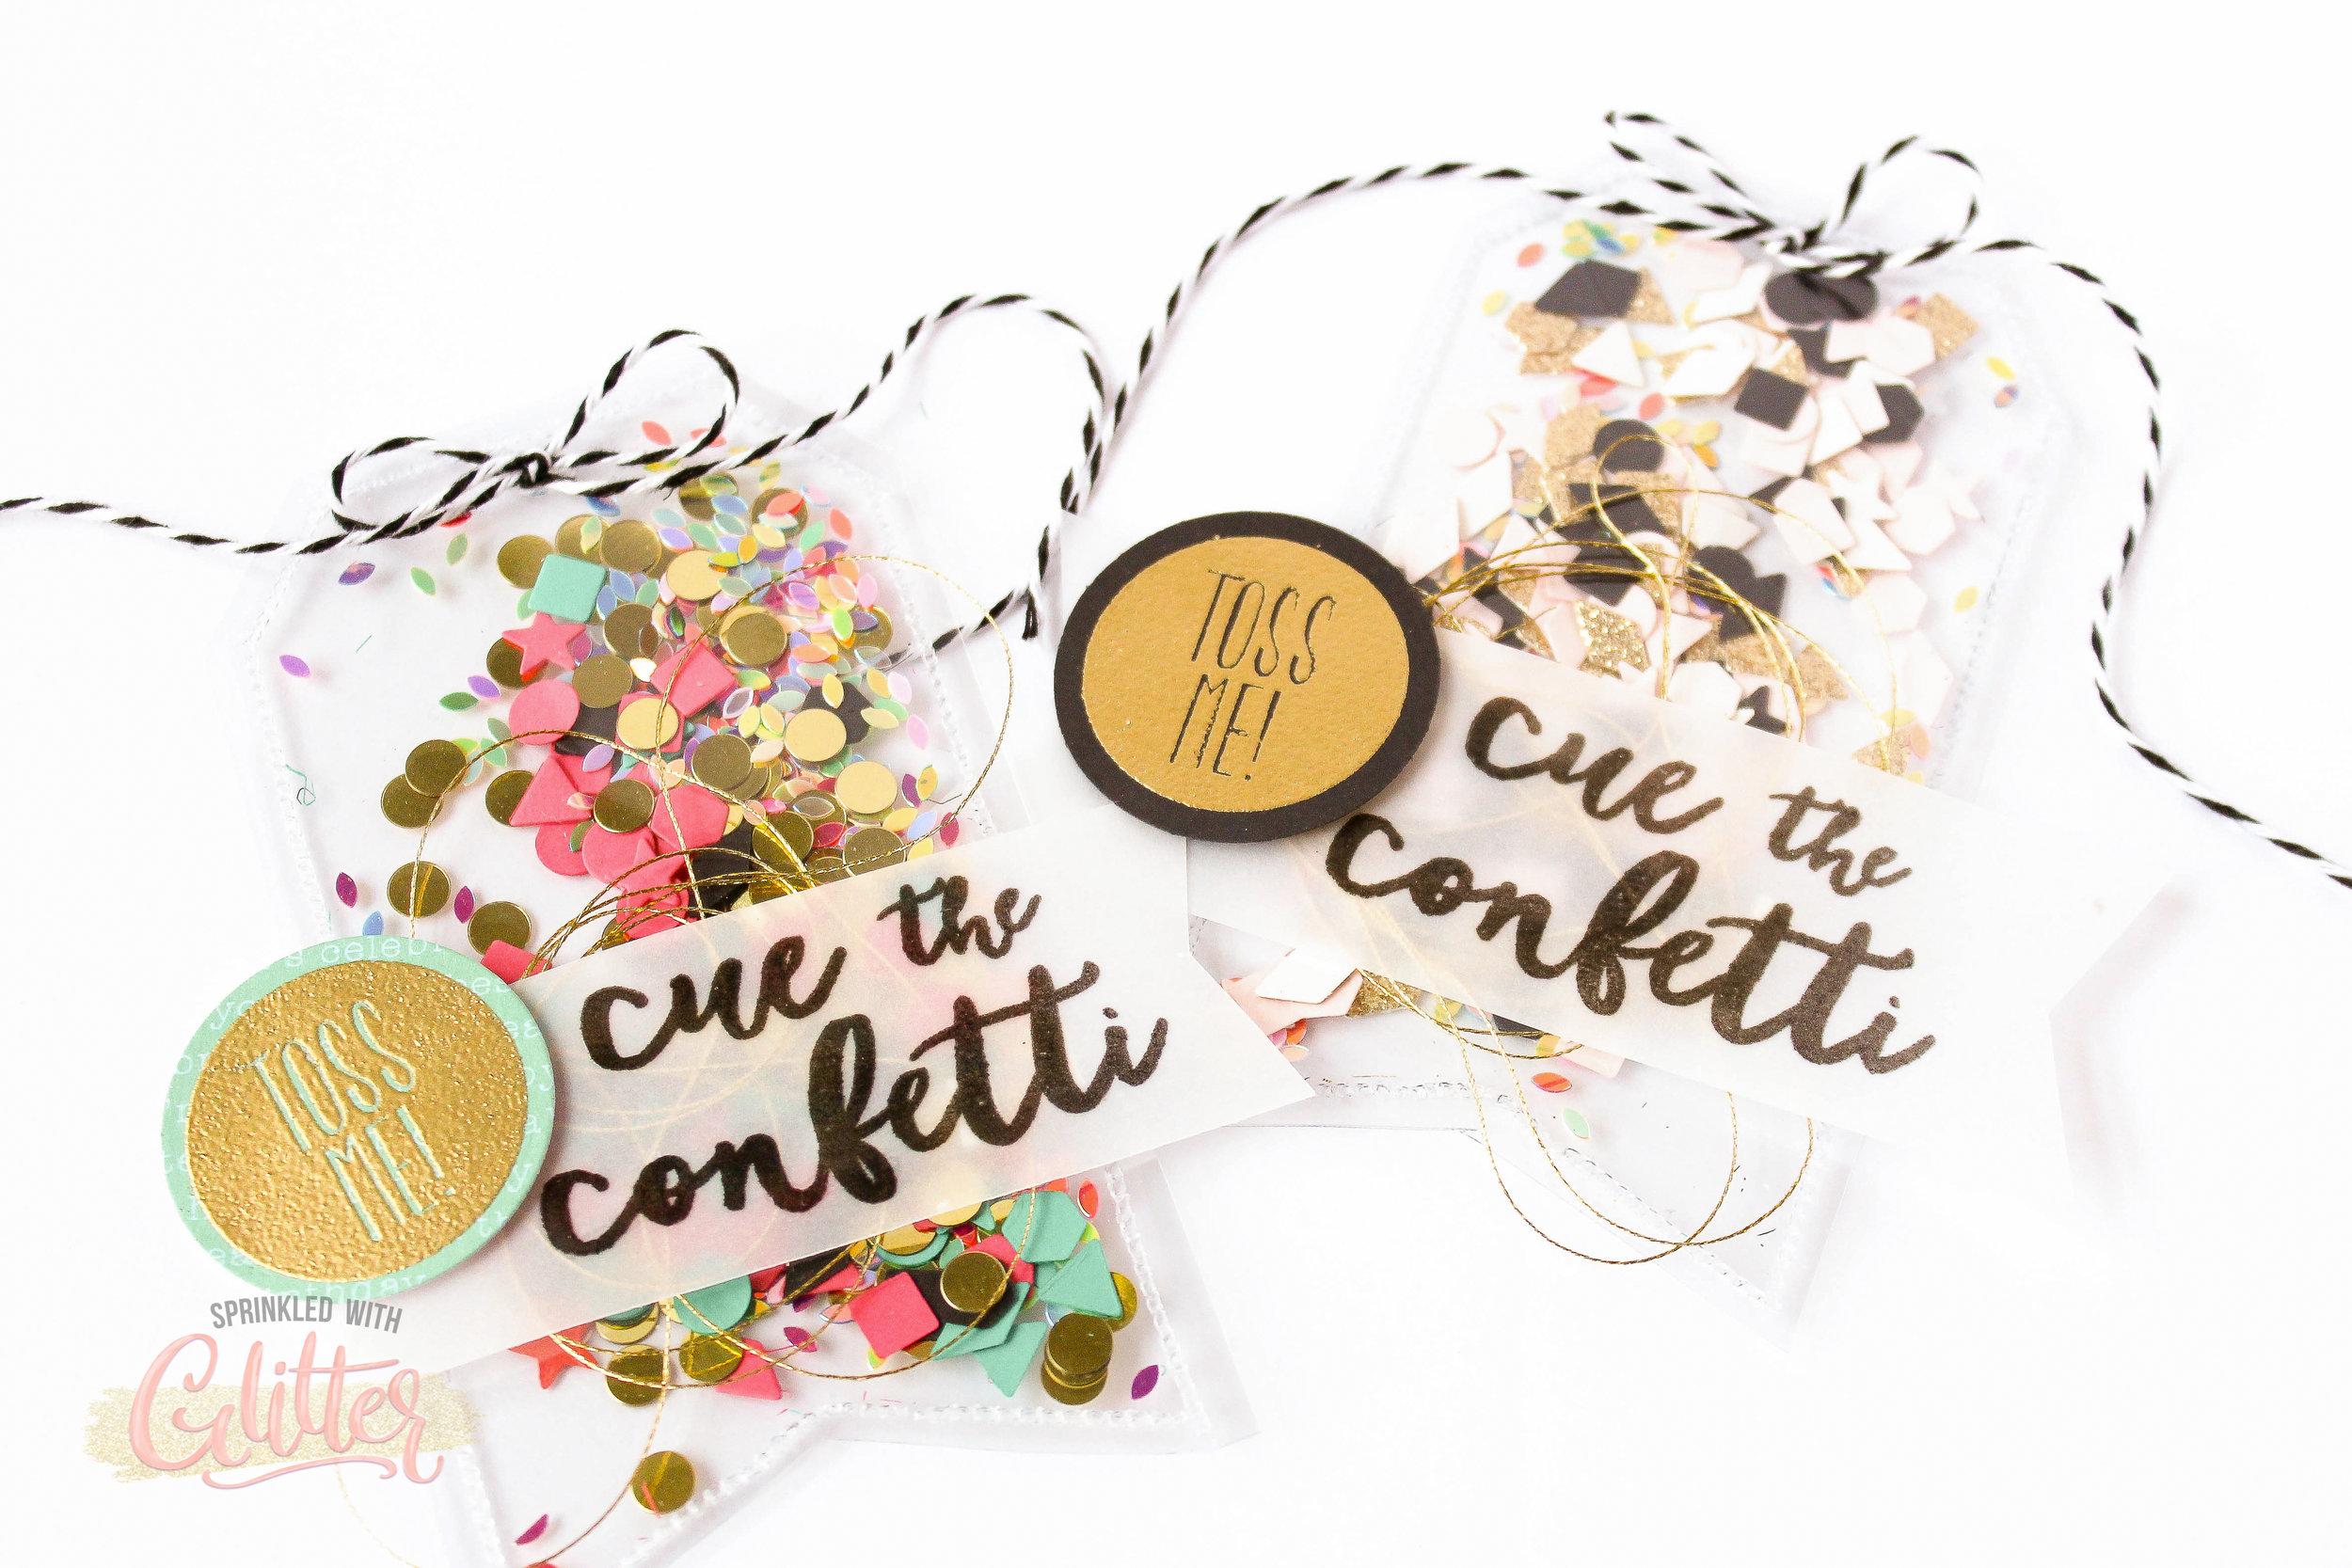 Confetti shaker tags watermark-20.jpg